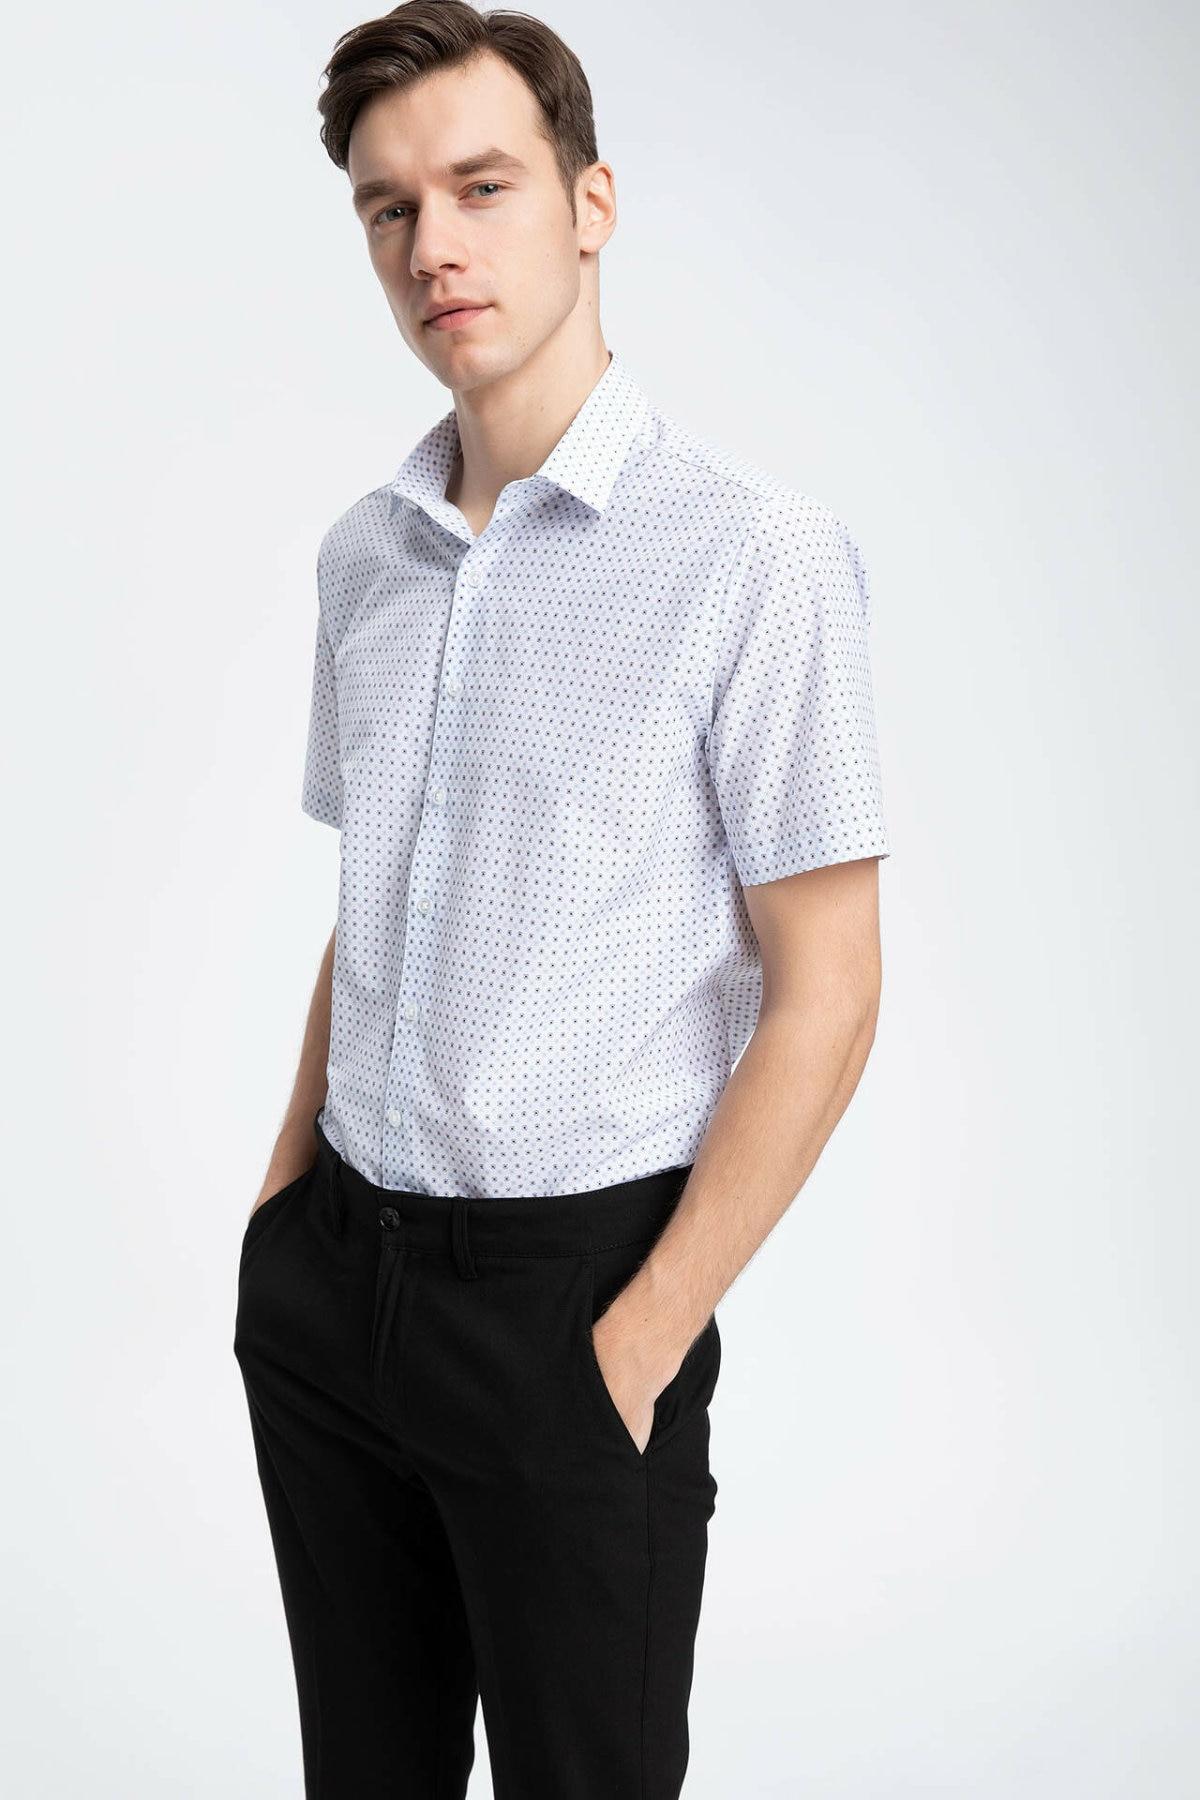 DeFacto Men Formal Solid Shirts Short Sleeve Casual Shirts Men Fashion Lapel Collar Shirt - K2986AZ19SMWT34-K2986AZ19SM